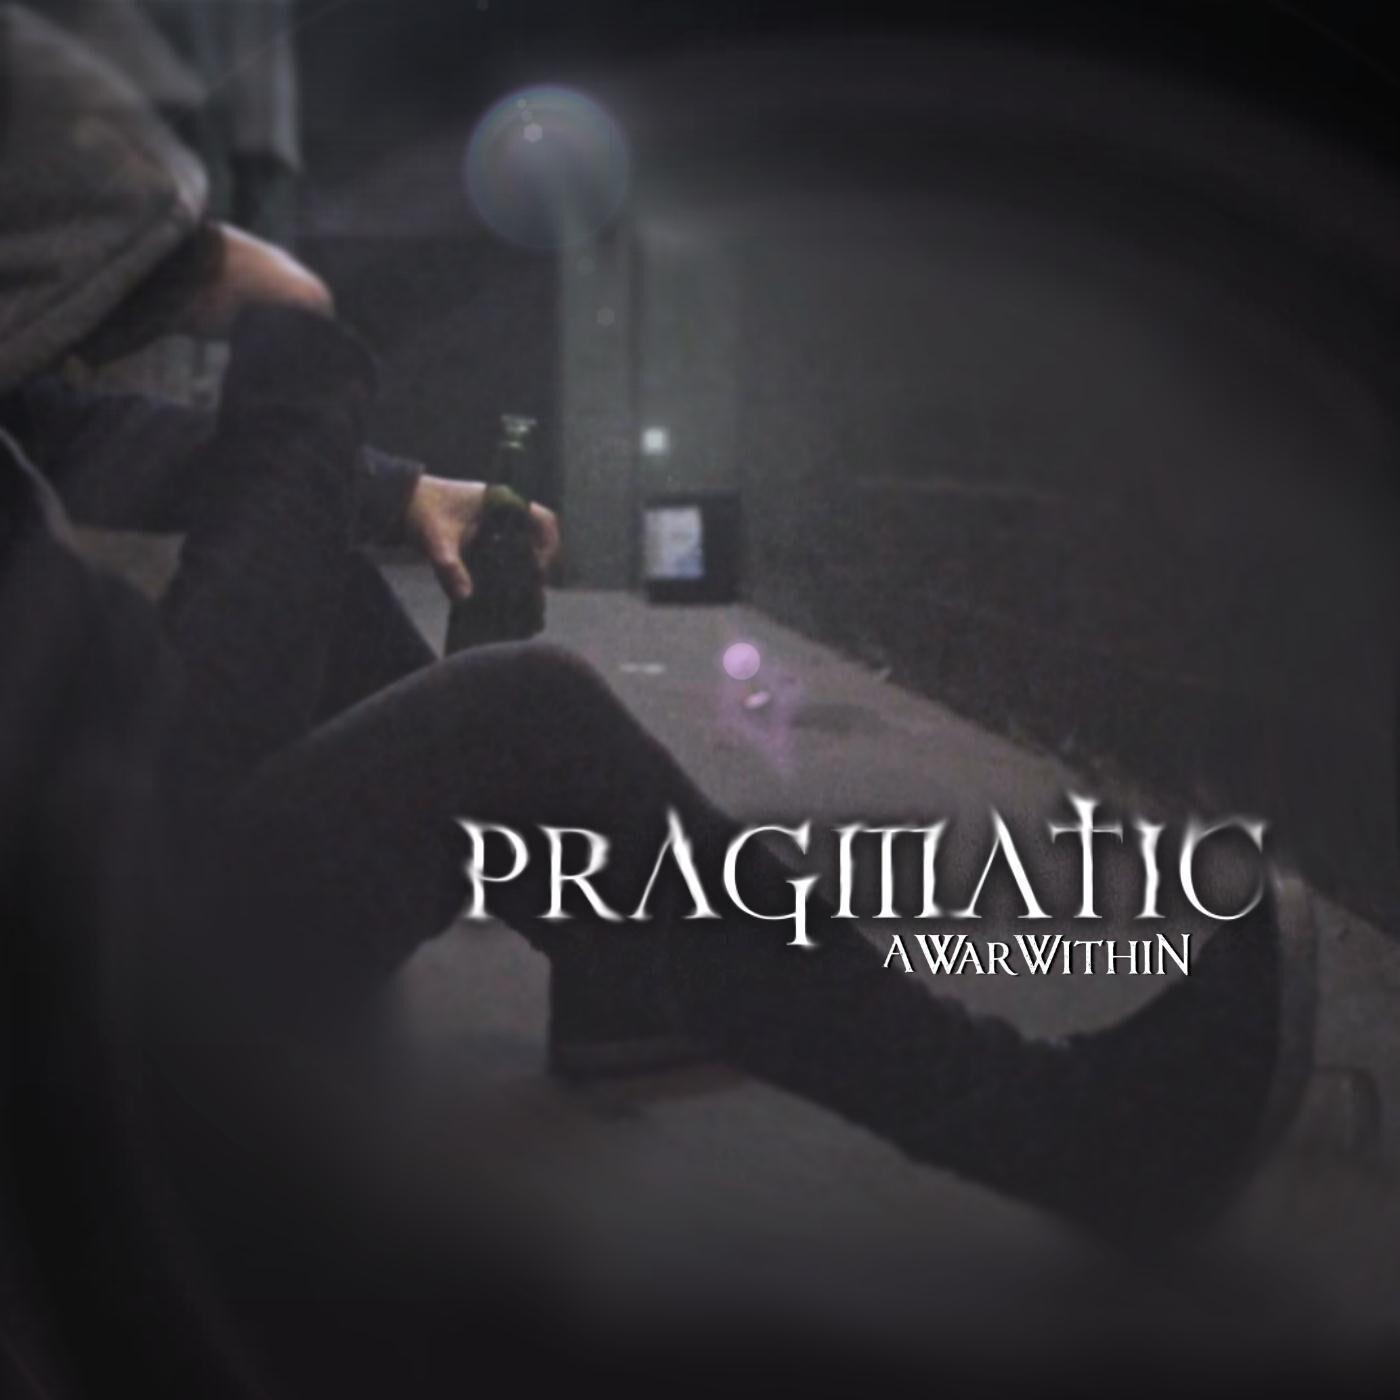 A War Within - Pragmatic [single] (2020)